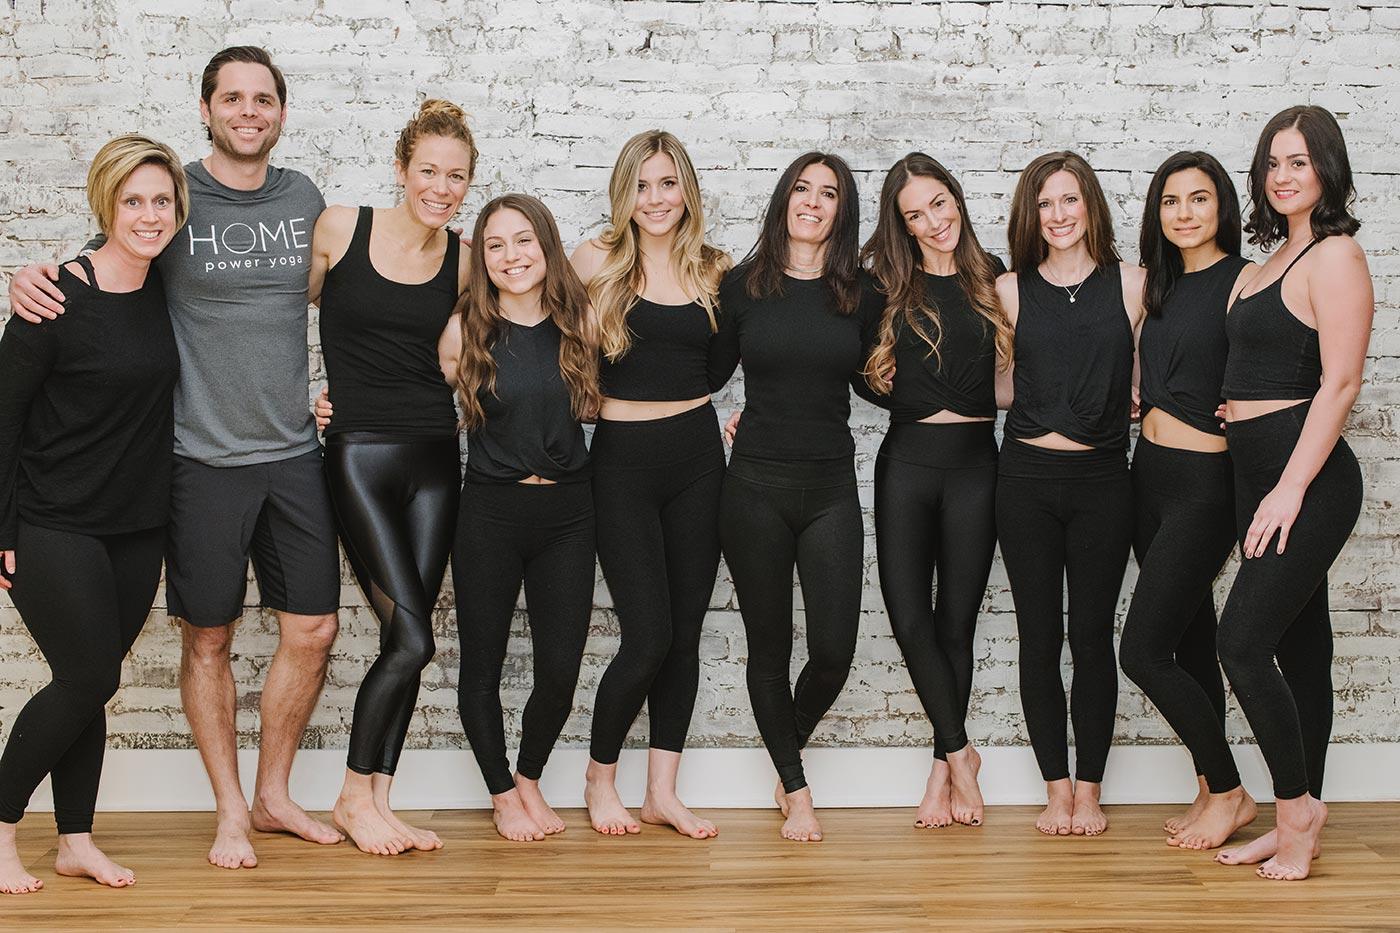 Home Power Yoga